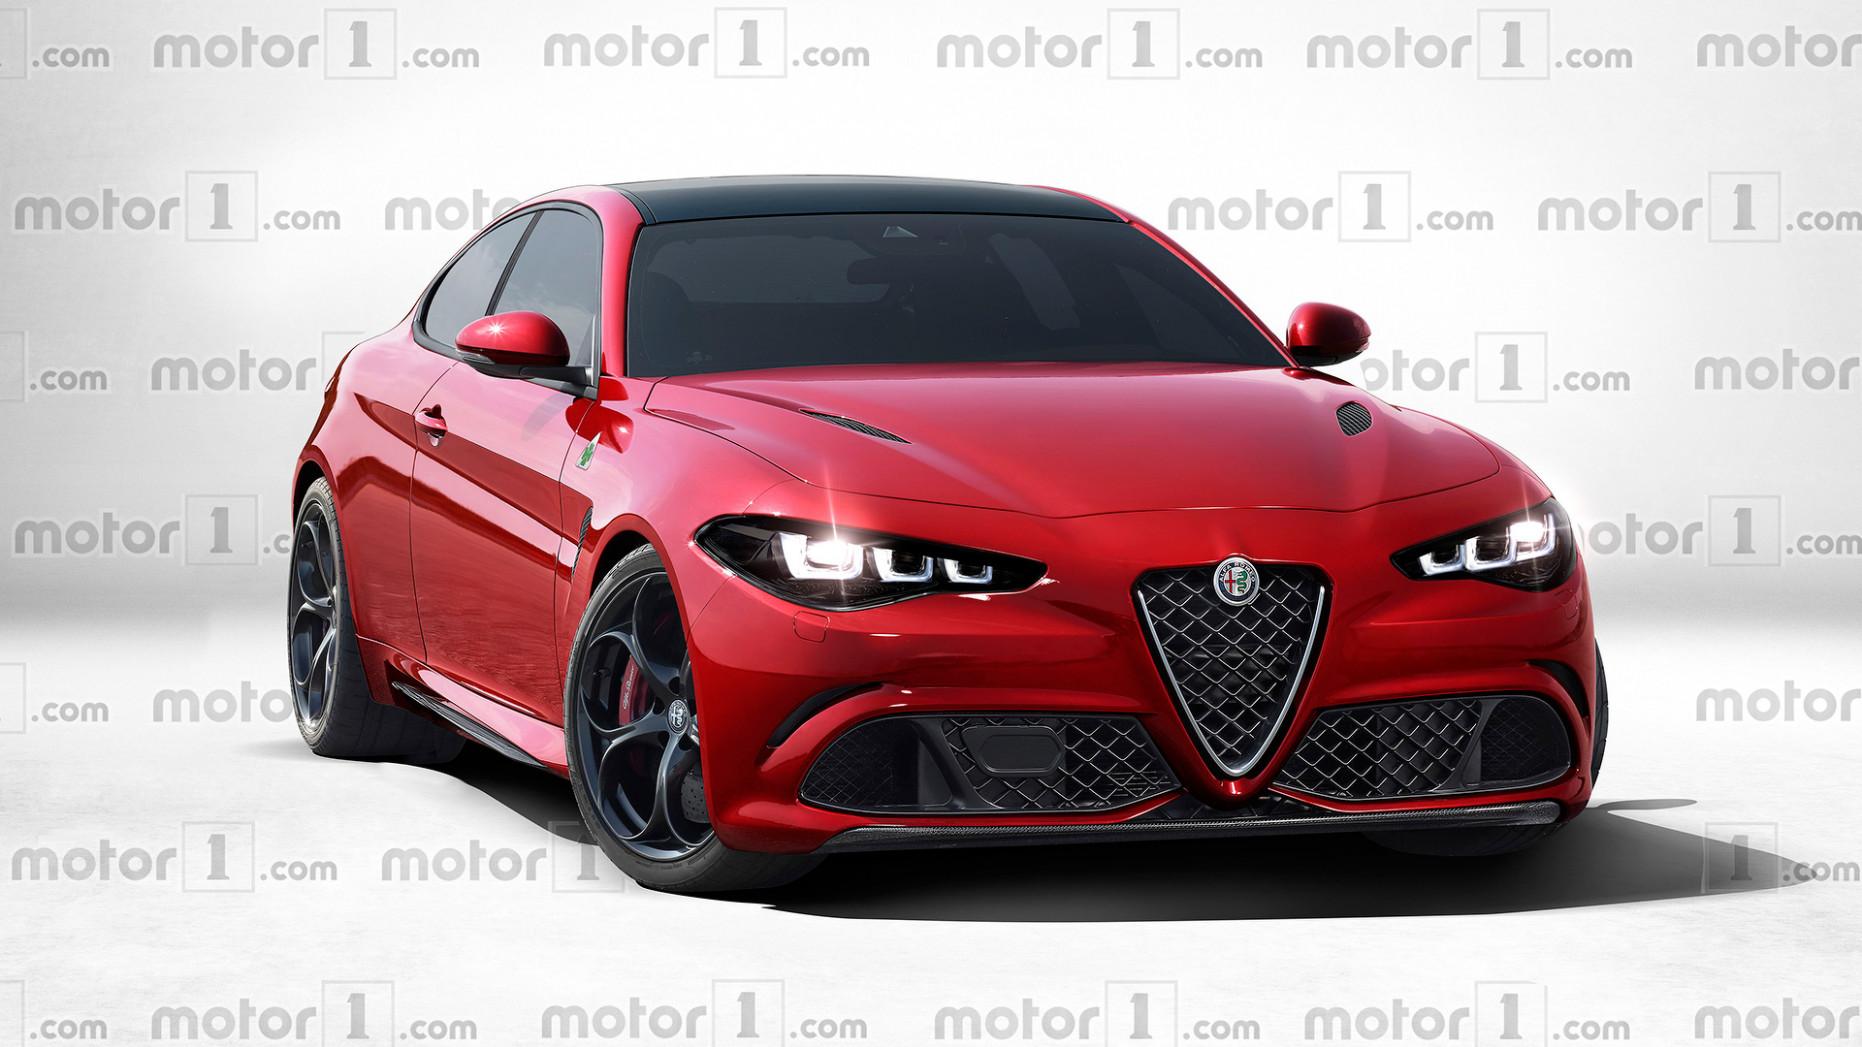 New Concept 2022 Alfa Romeo Giulia